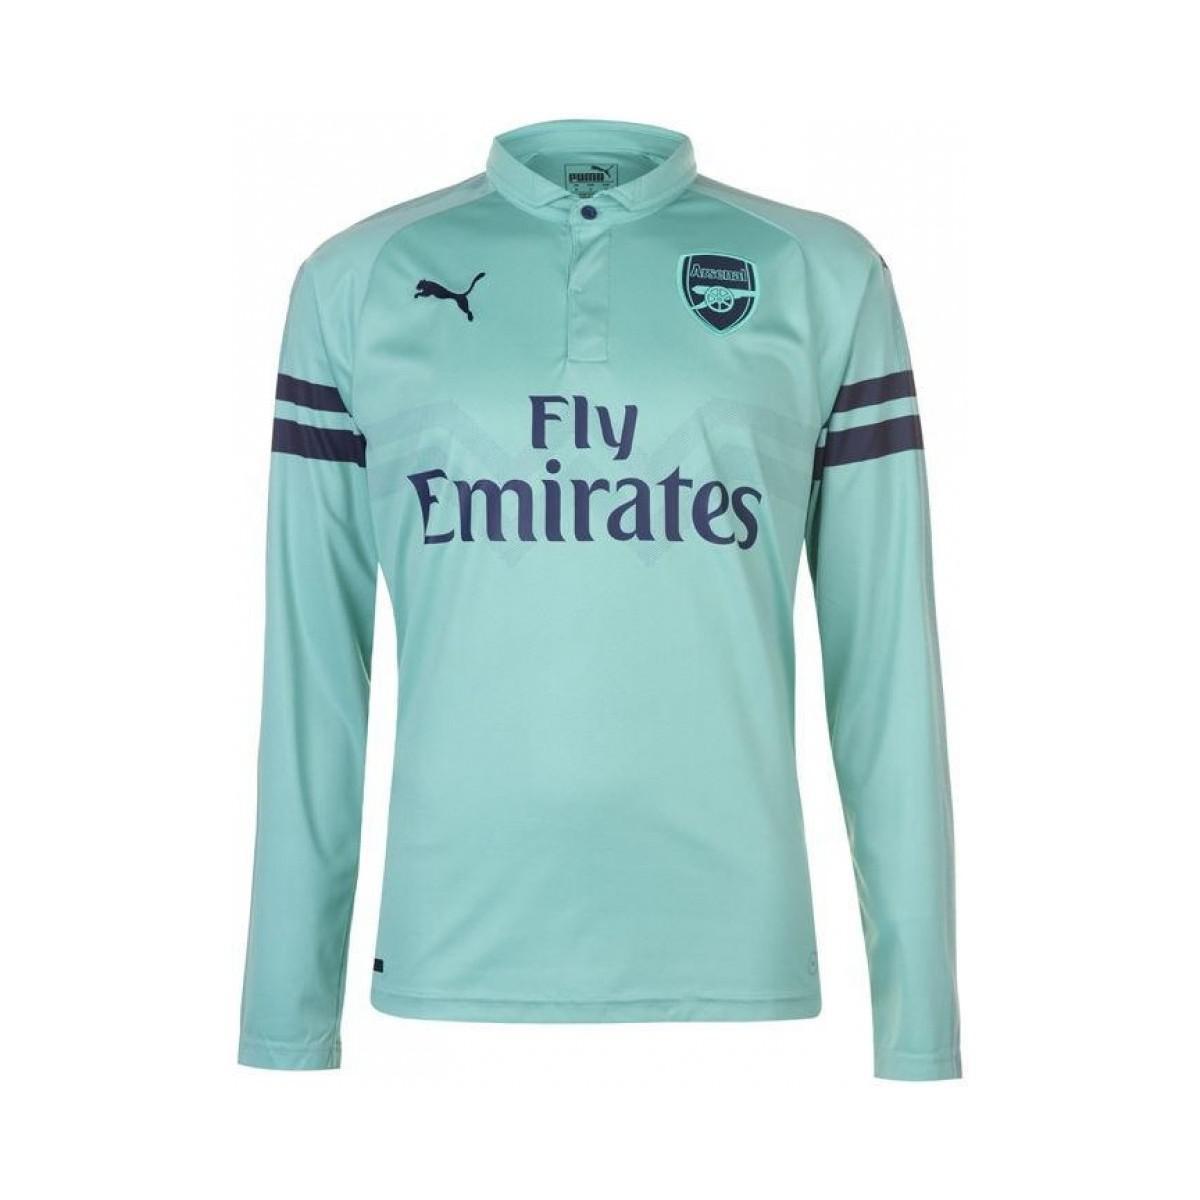 ee66236decd Puma 2018-2019 Arsenal Third Long Sleeve Shirt (kolasinac 31 ...